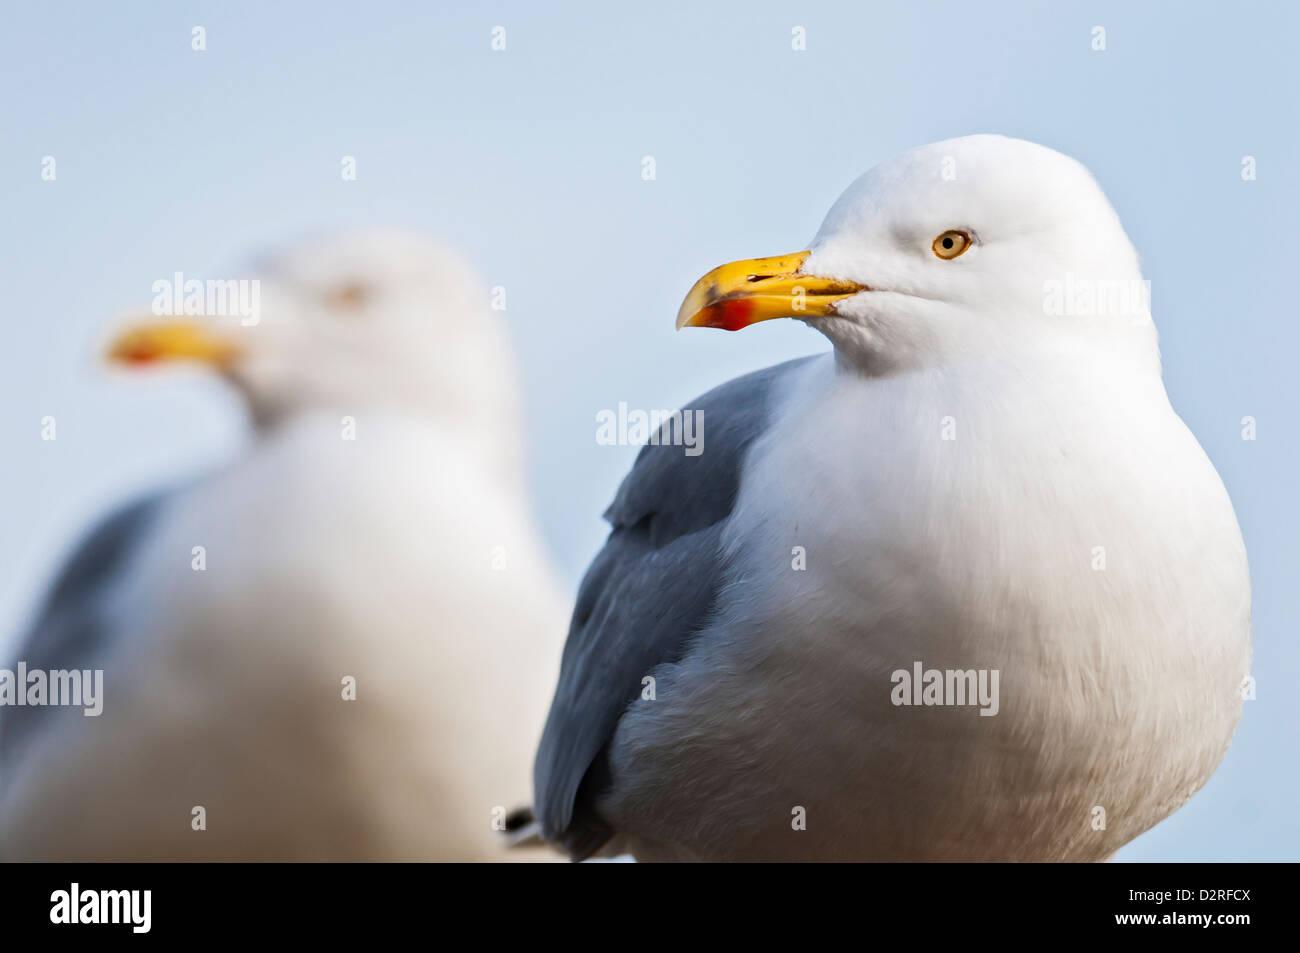 Two Herring Gulls, Larus argentatus - Stock Image